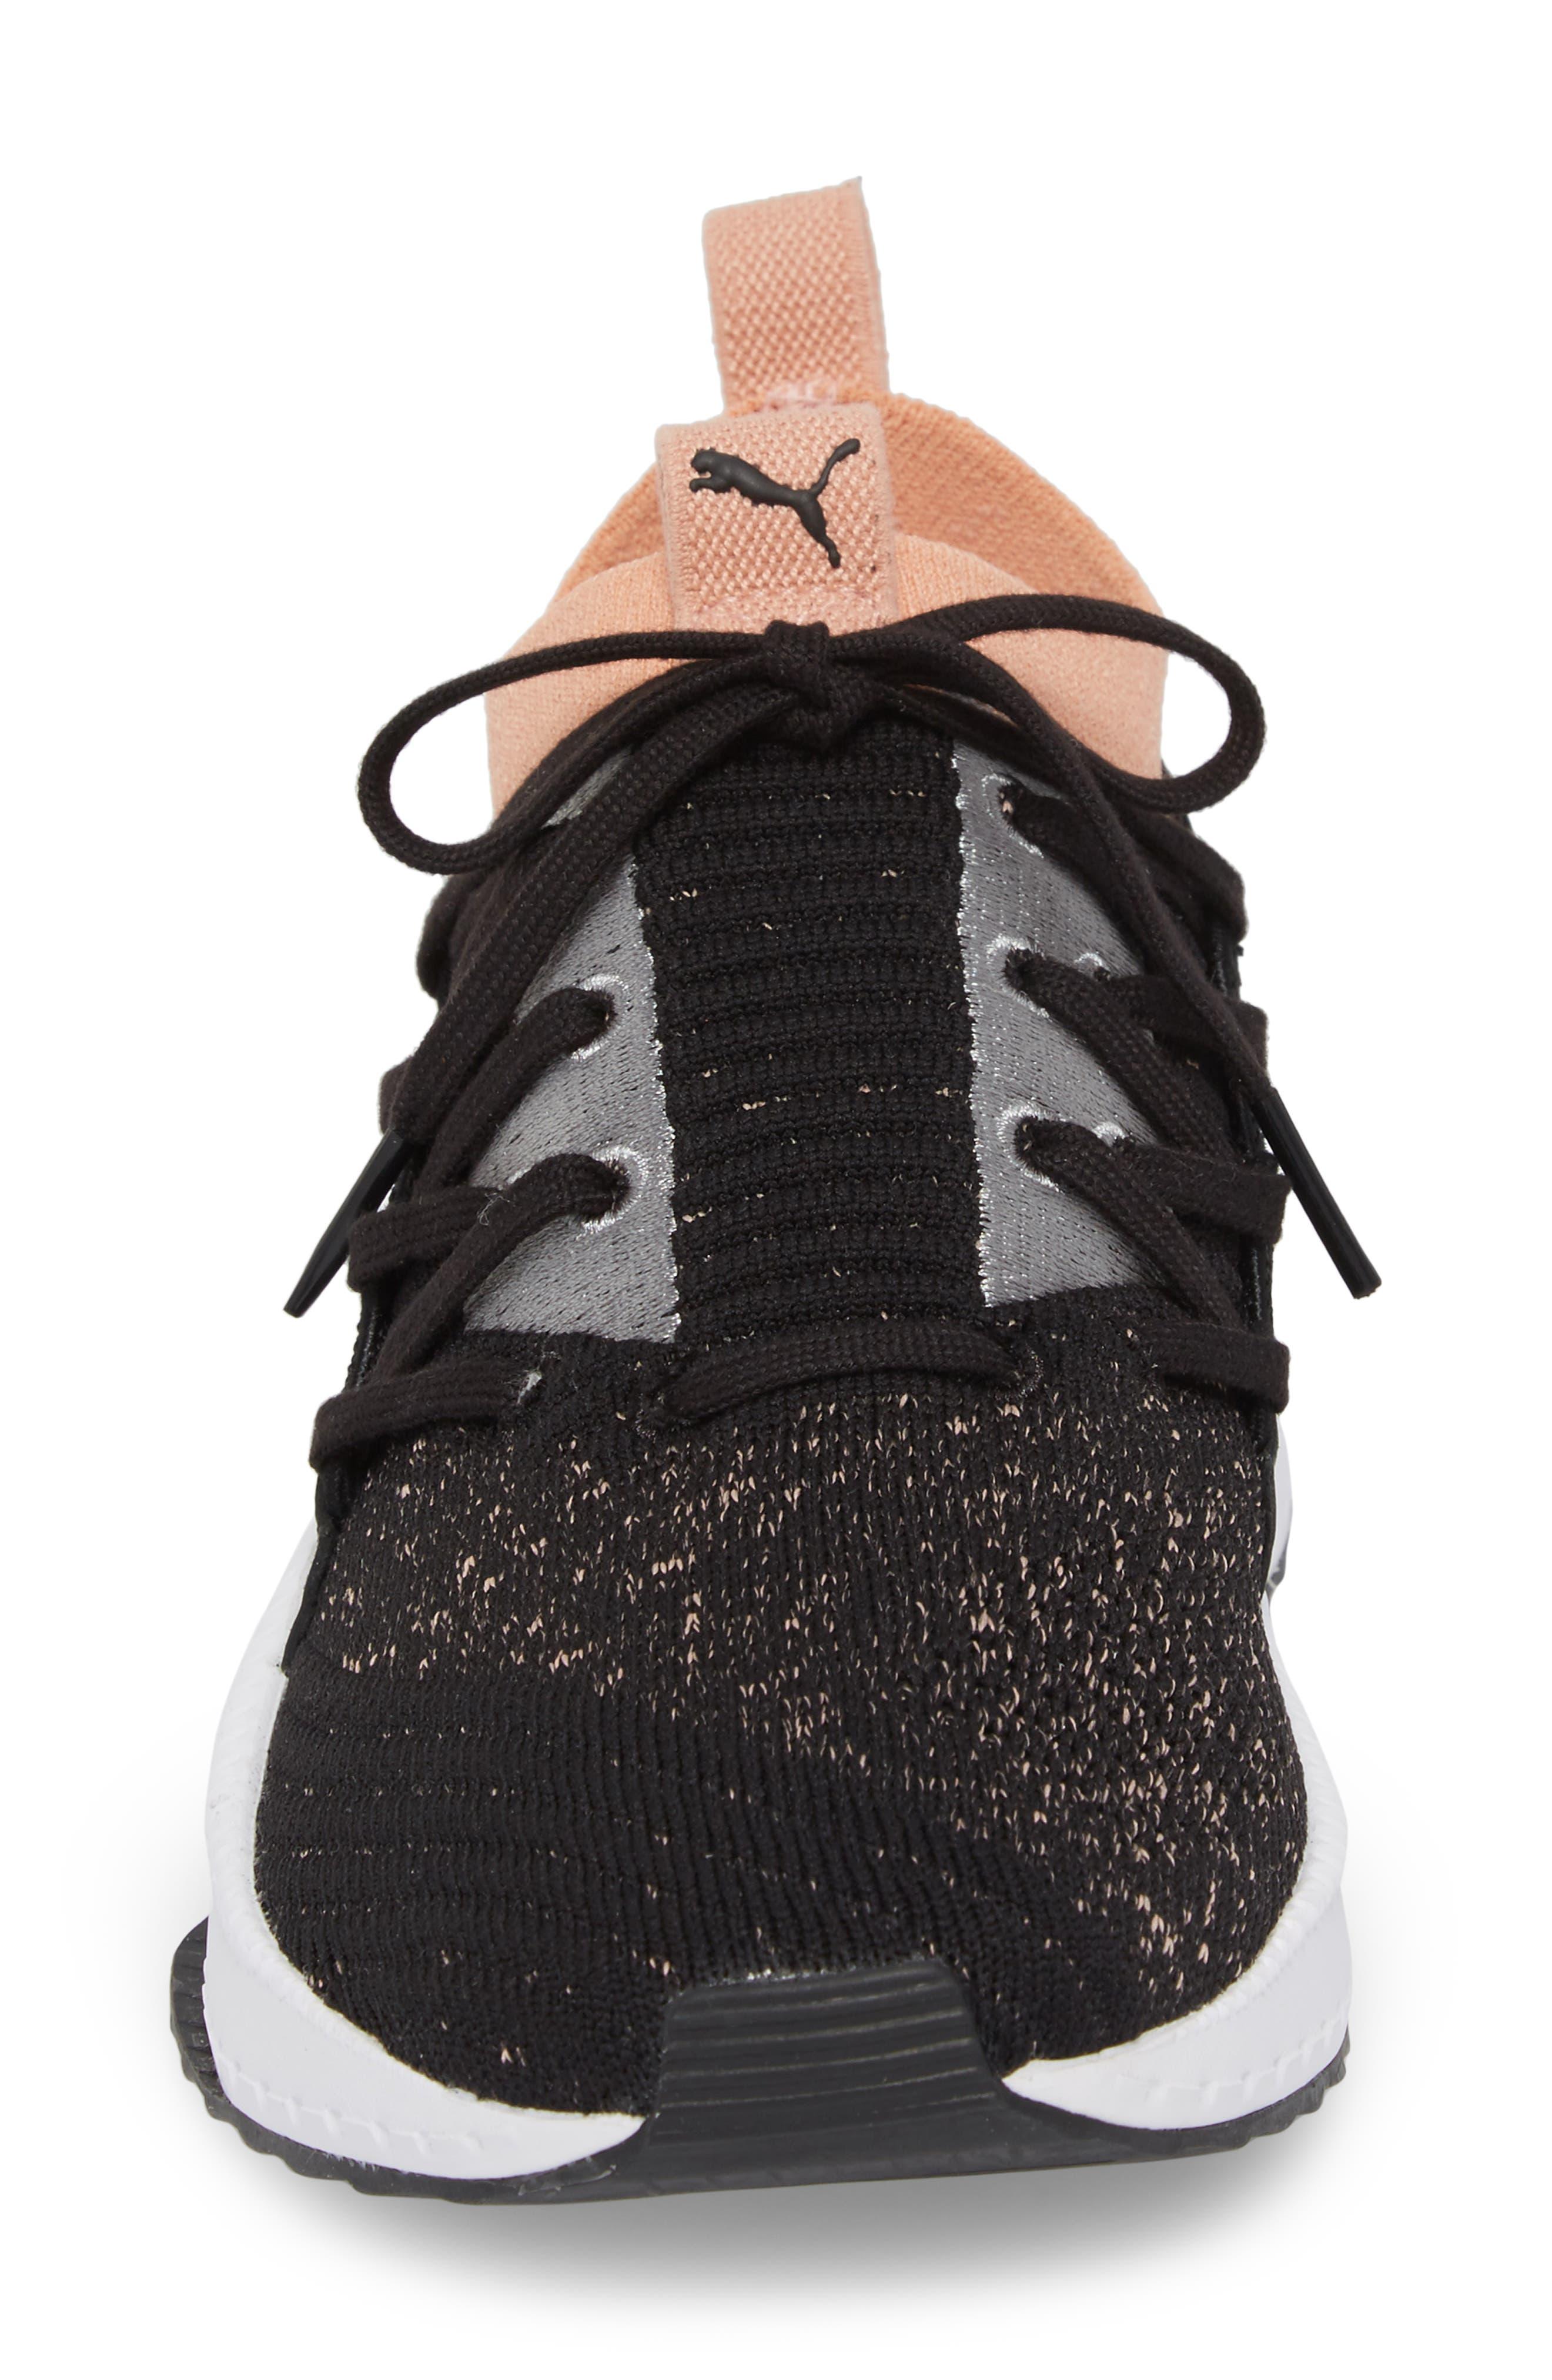 Tsugi Jun Knit Sneaker,                             Alternate thumbnail 4, color,                             001